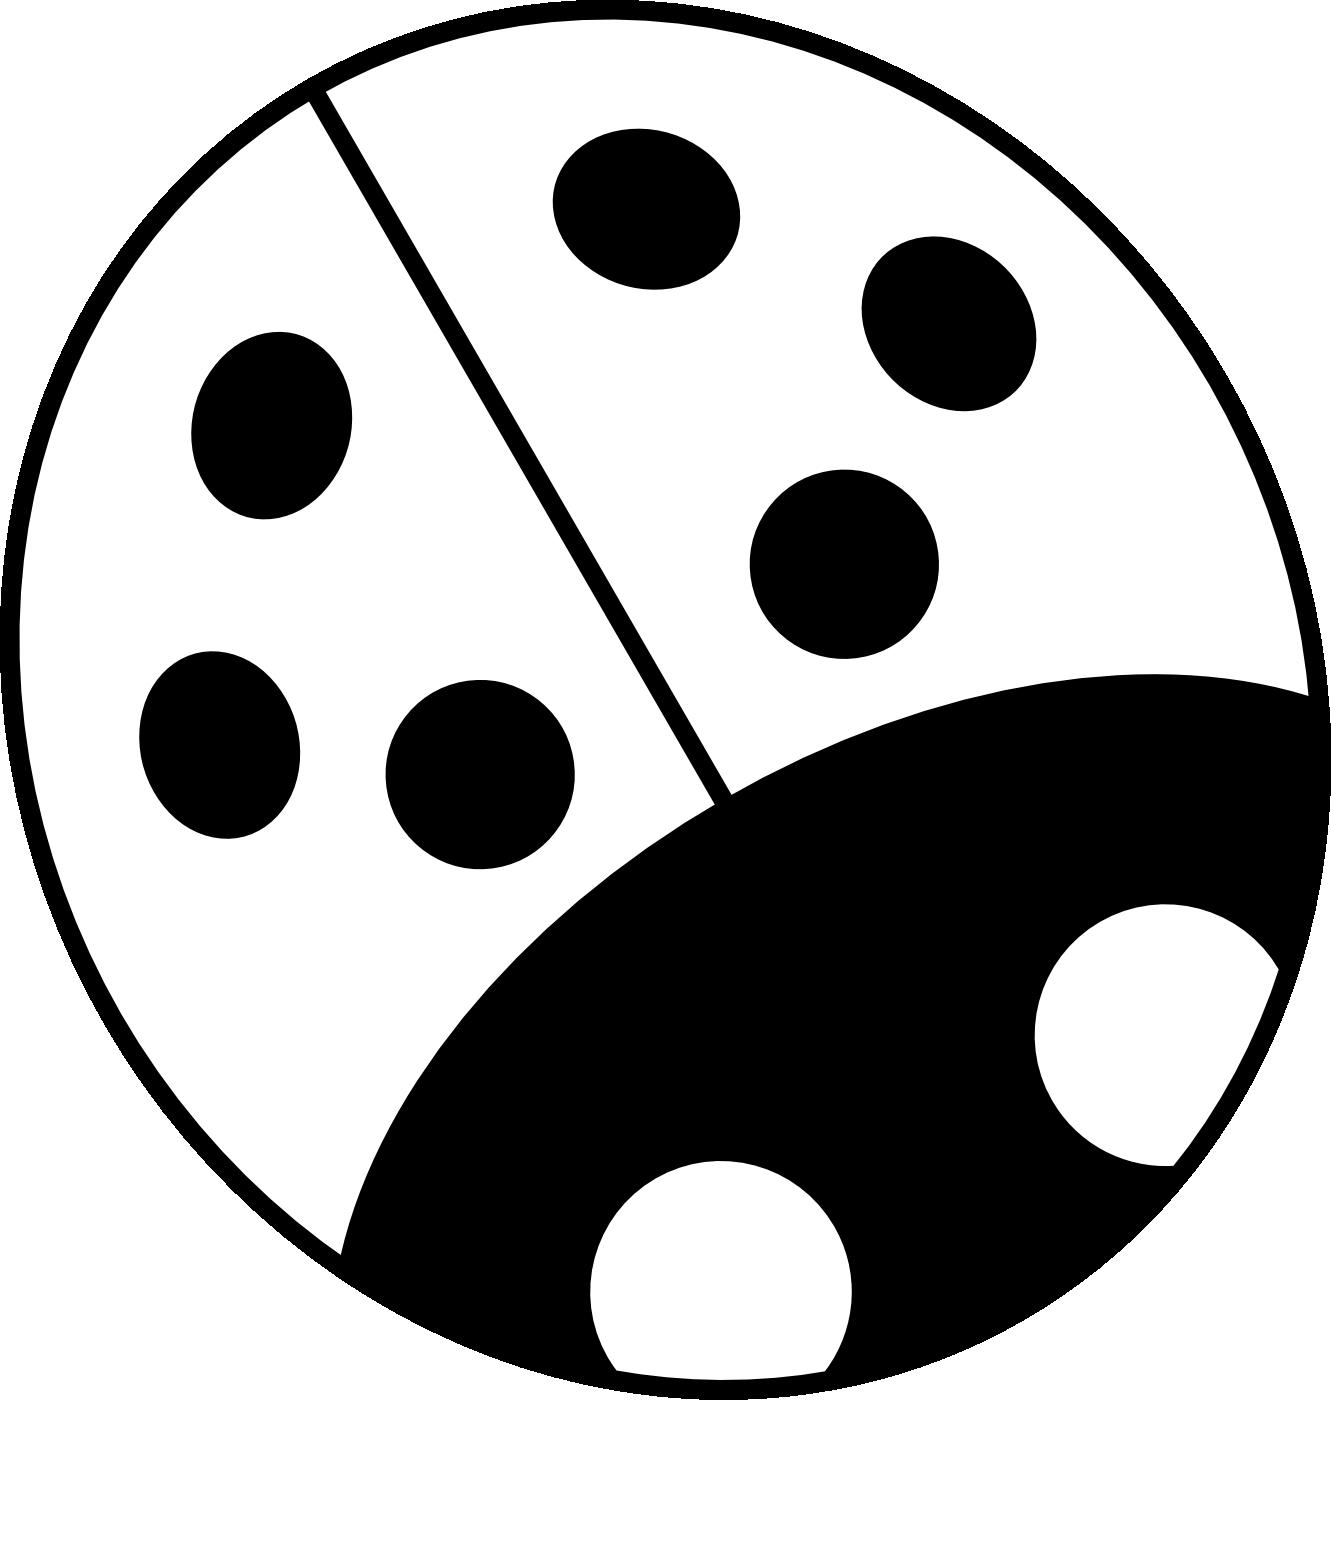 Clip art flower black and white clipart panda free clipart images ladybug20on20blue20flower mightylinksfo